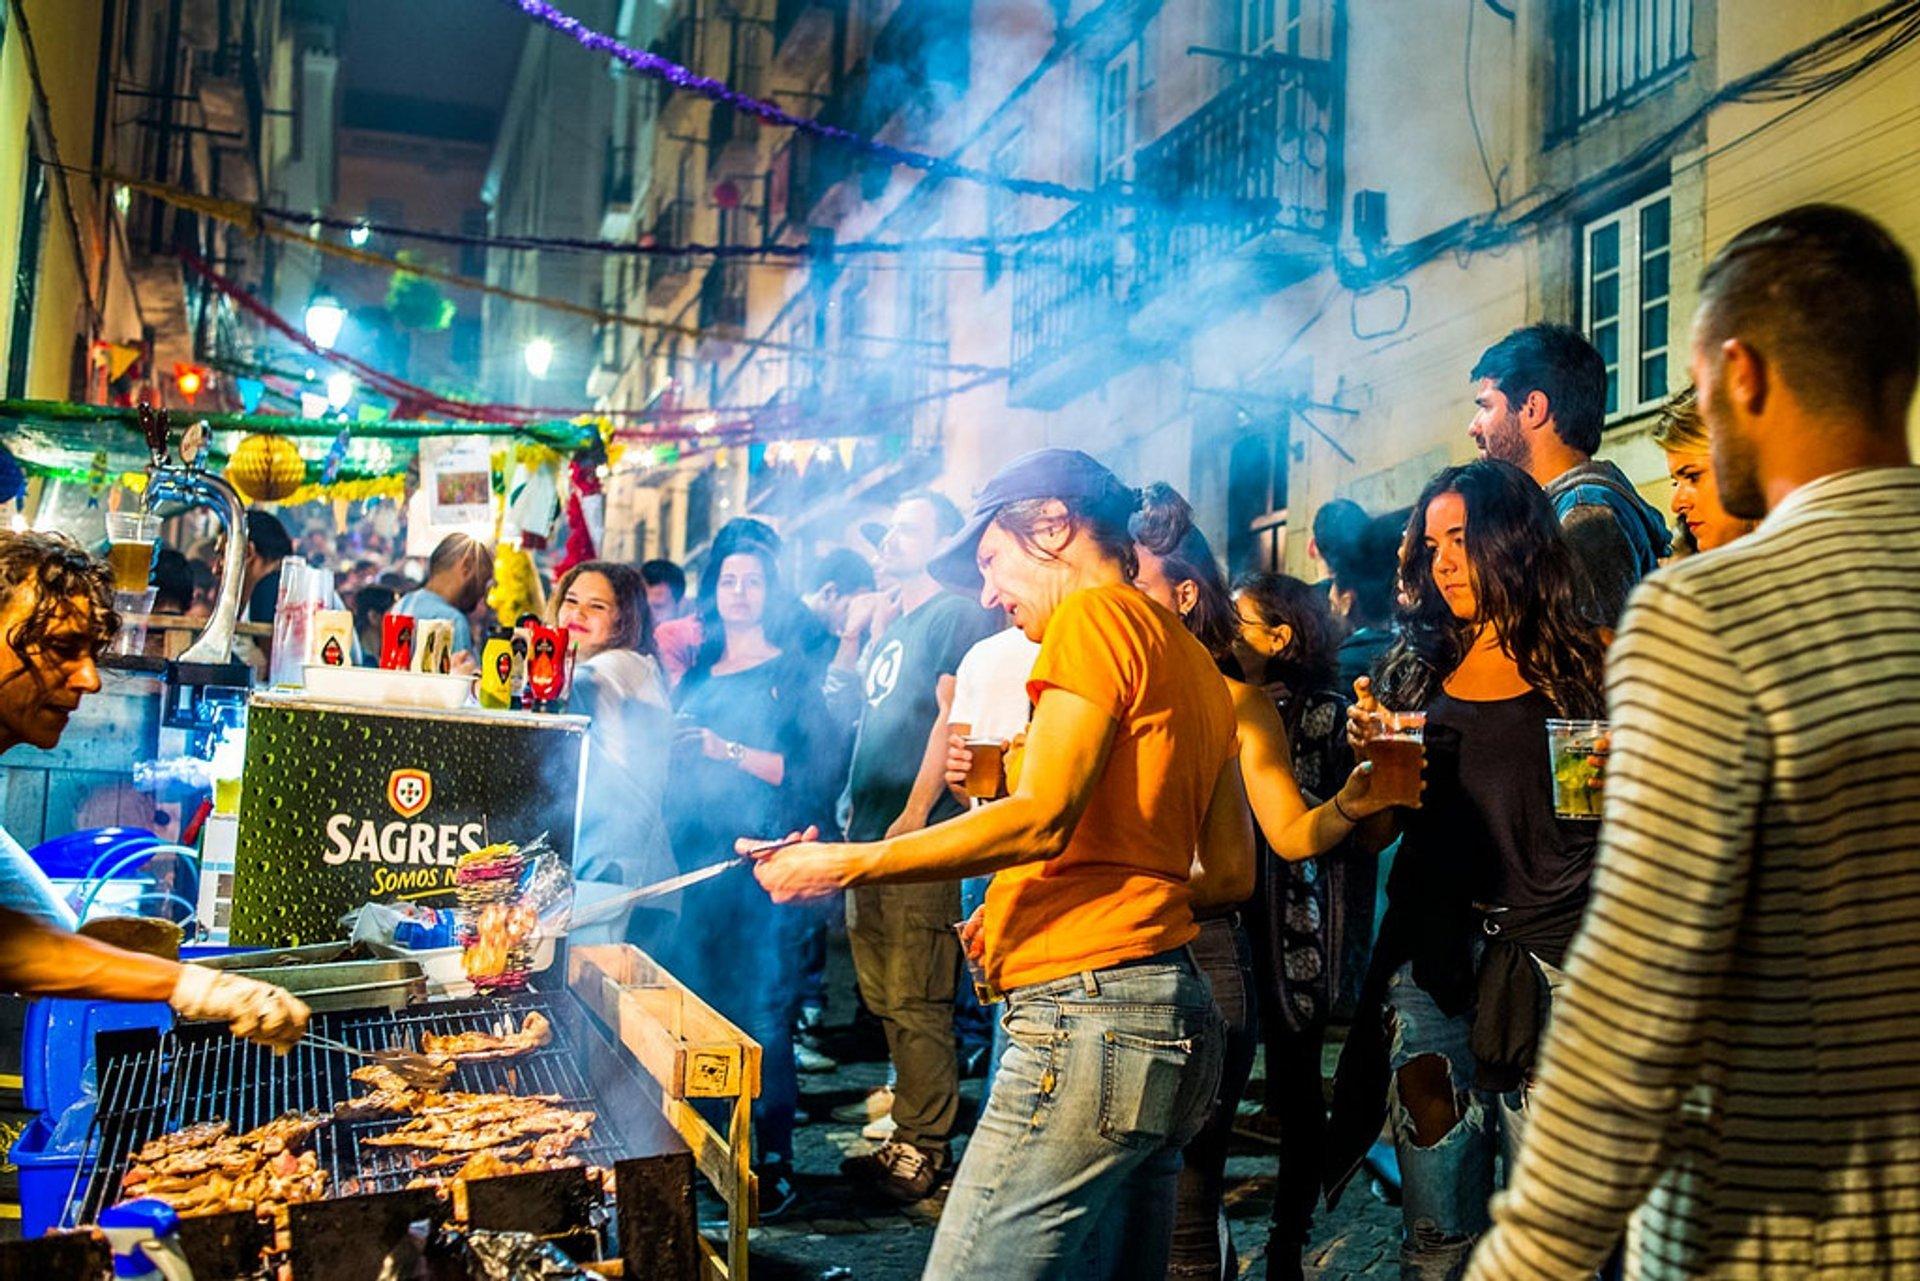 Festas de Lisboa (Festas dos Santos Populares) in Lisbon - Best Season 2020